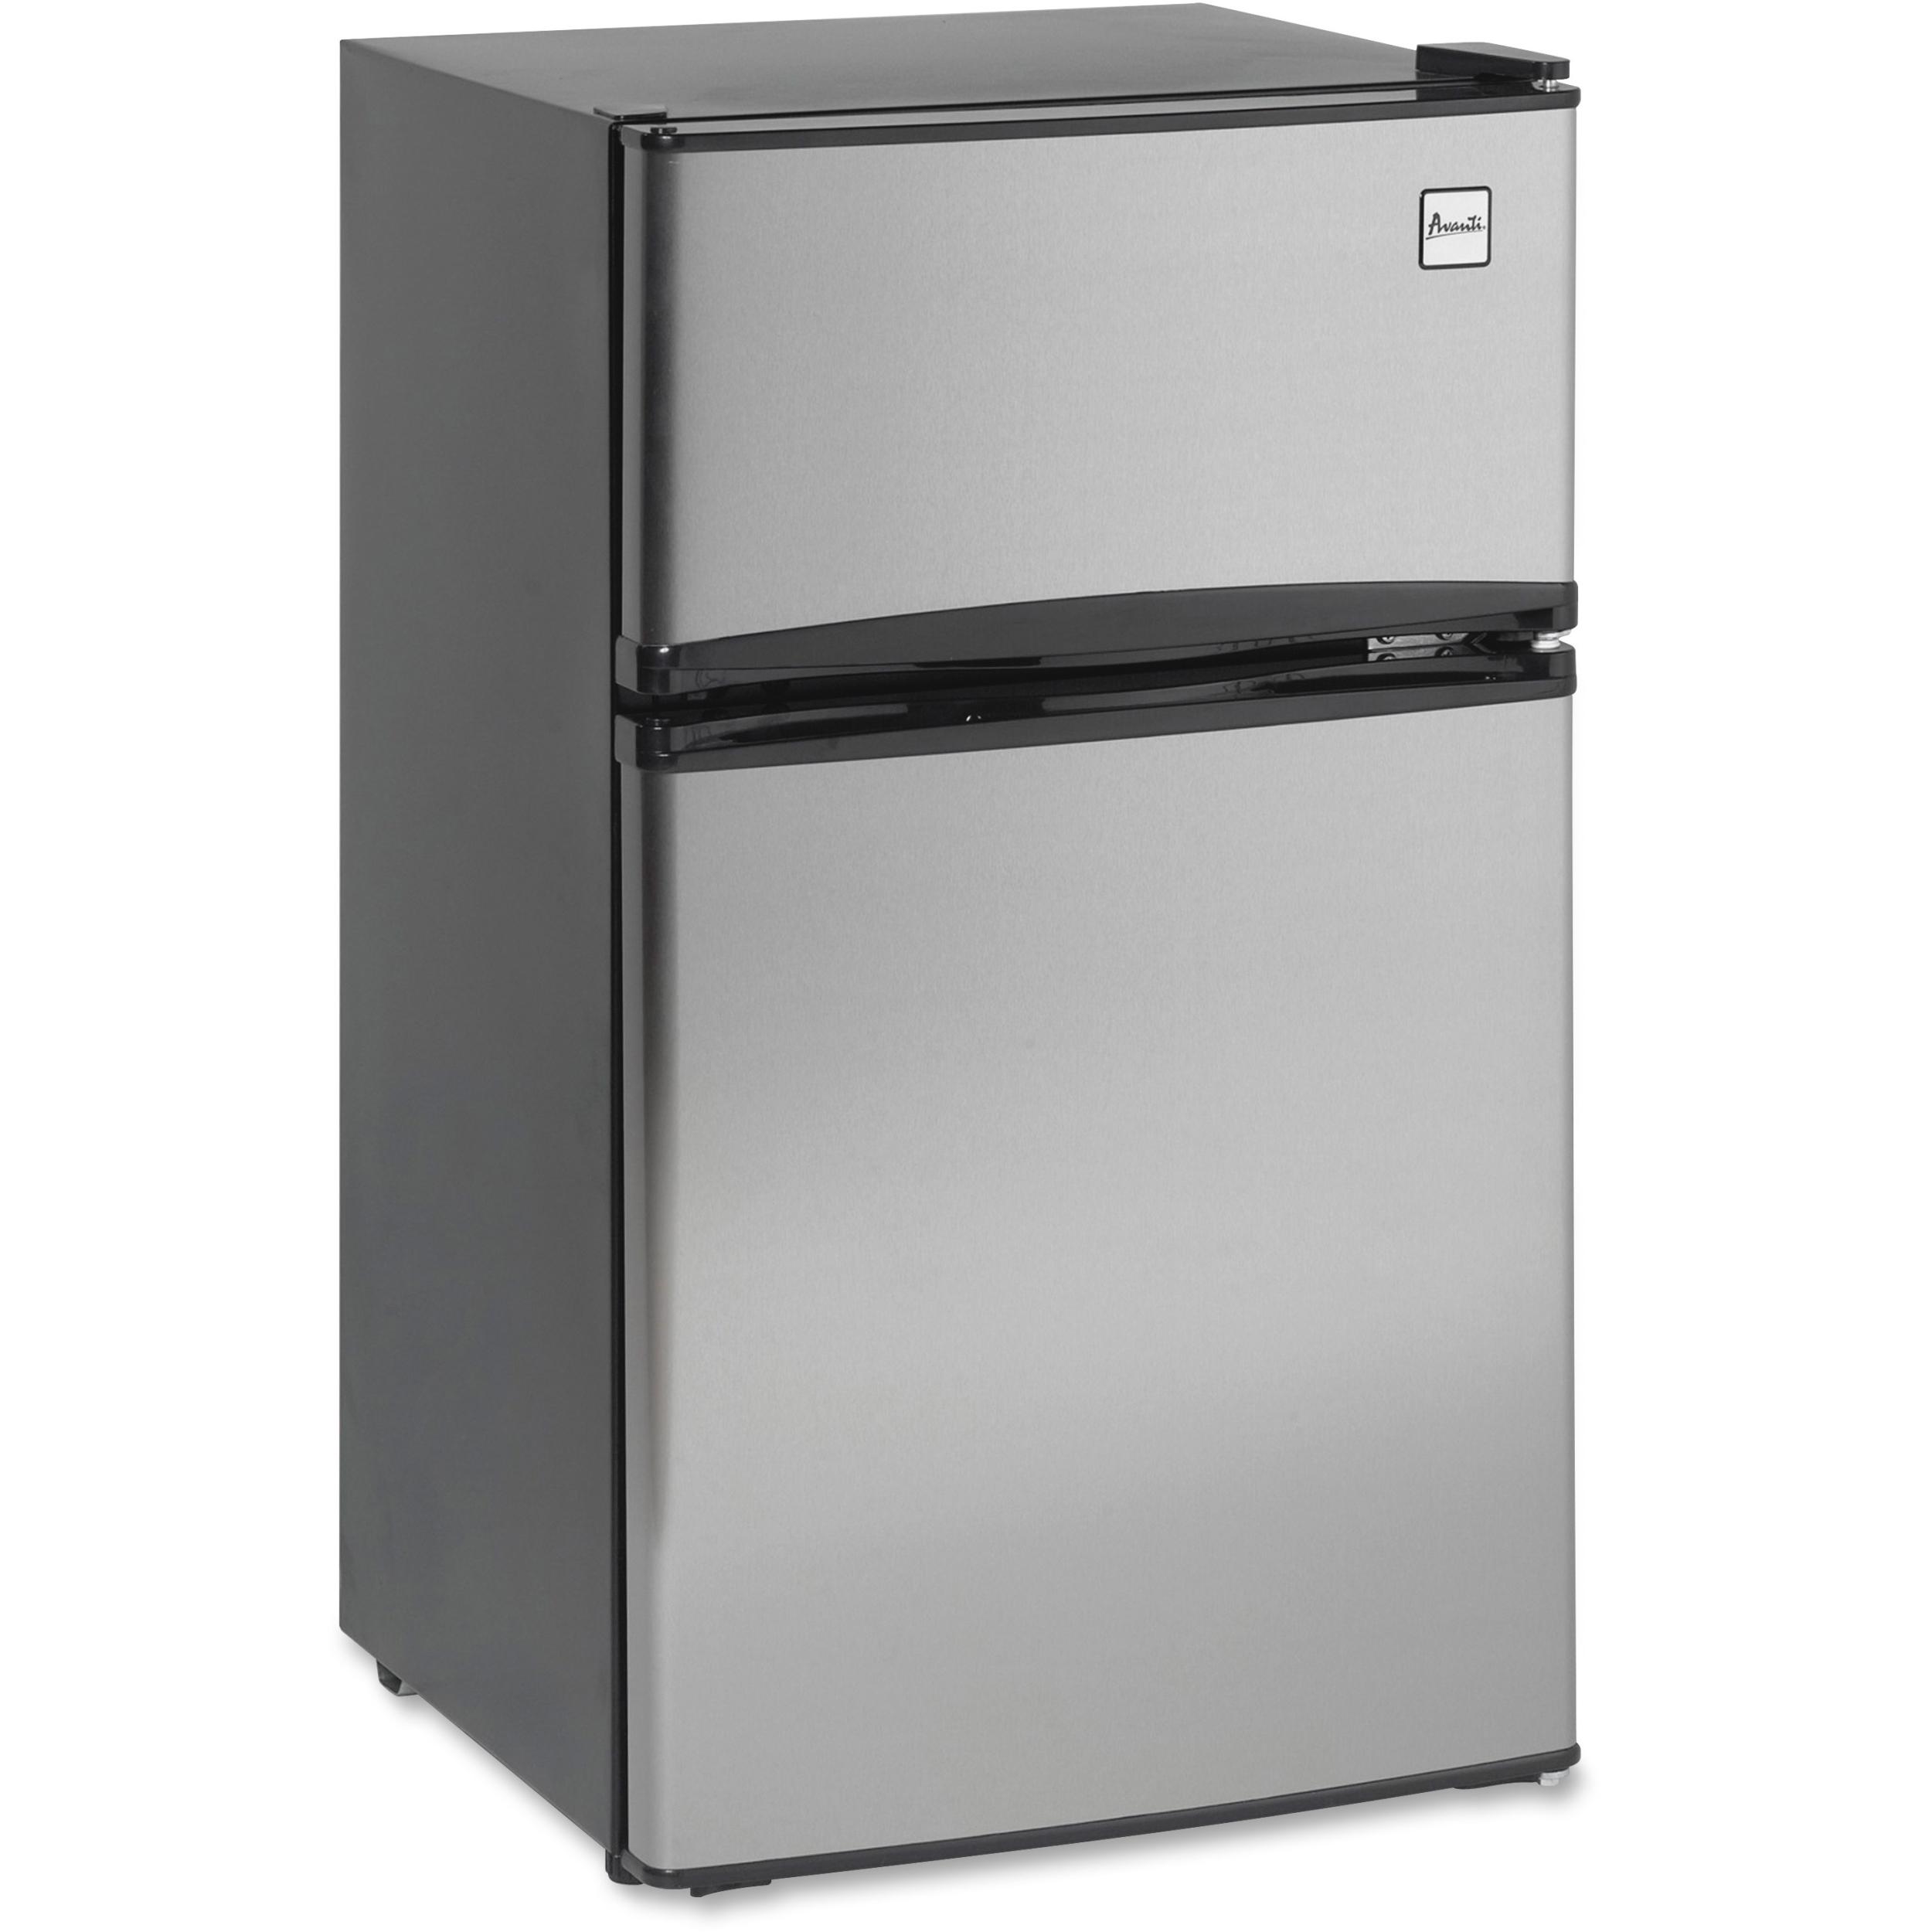 Avanti Refrigerator | 4.5 Cubic Feet Fridge | Small Frigerator